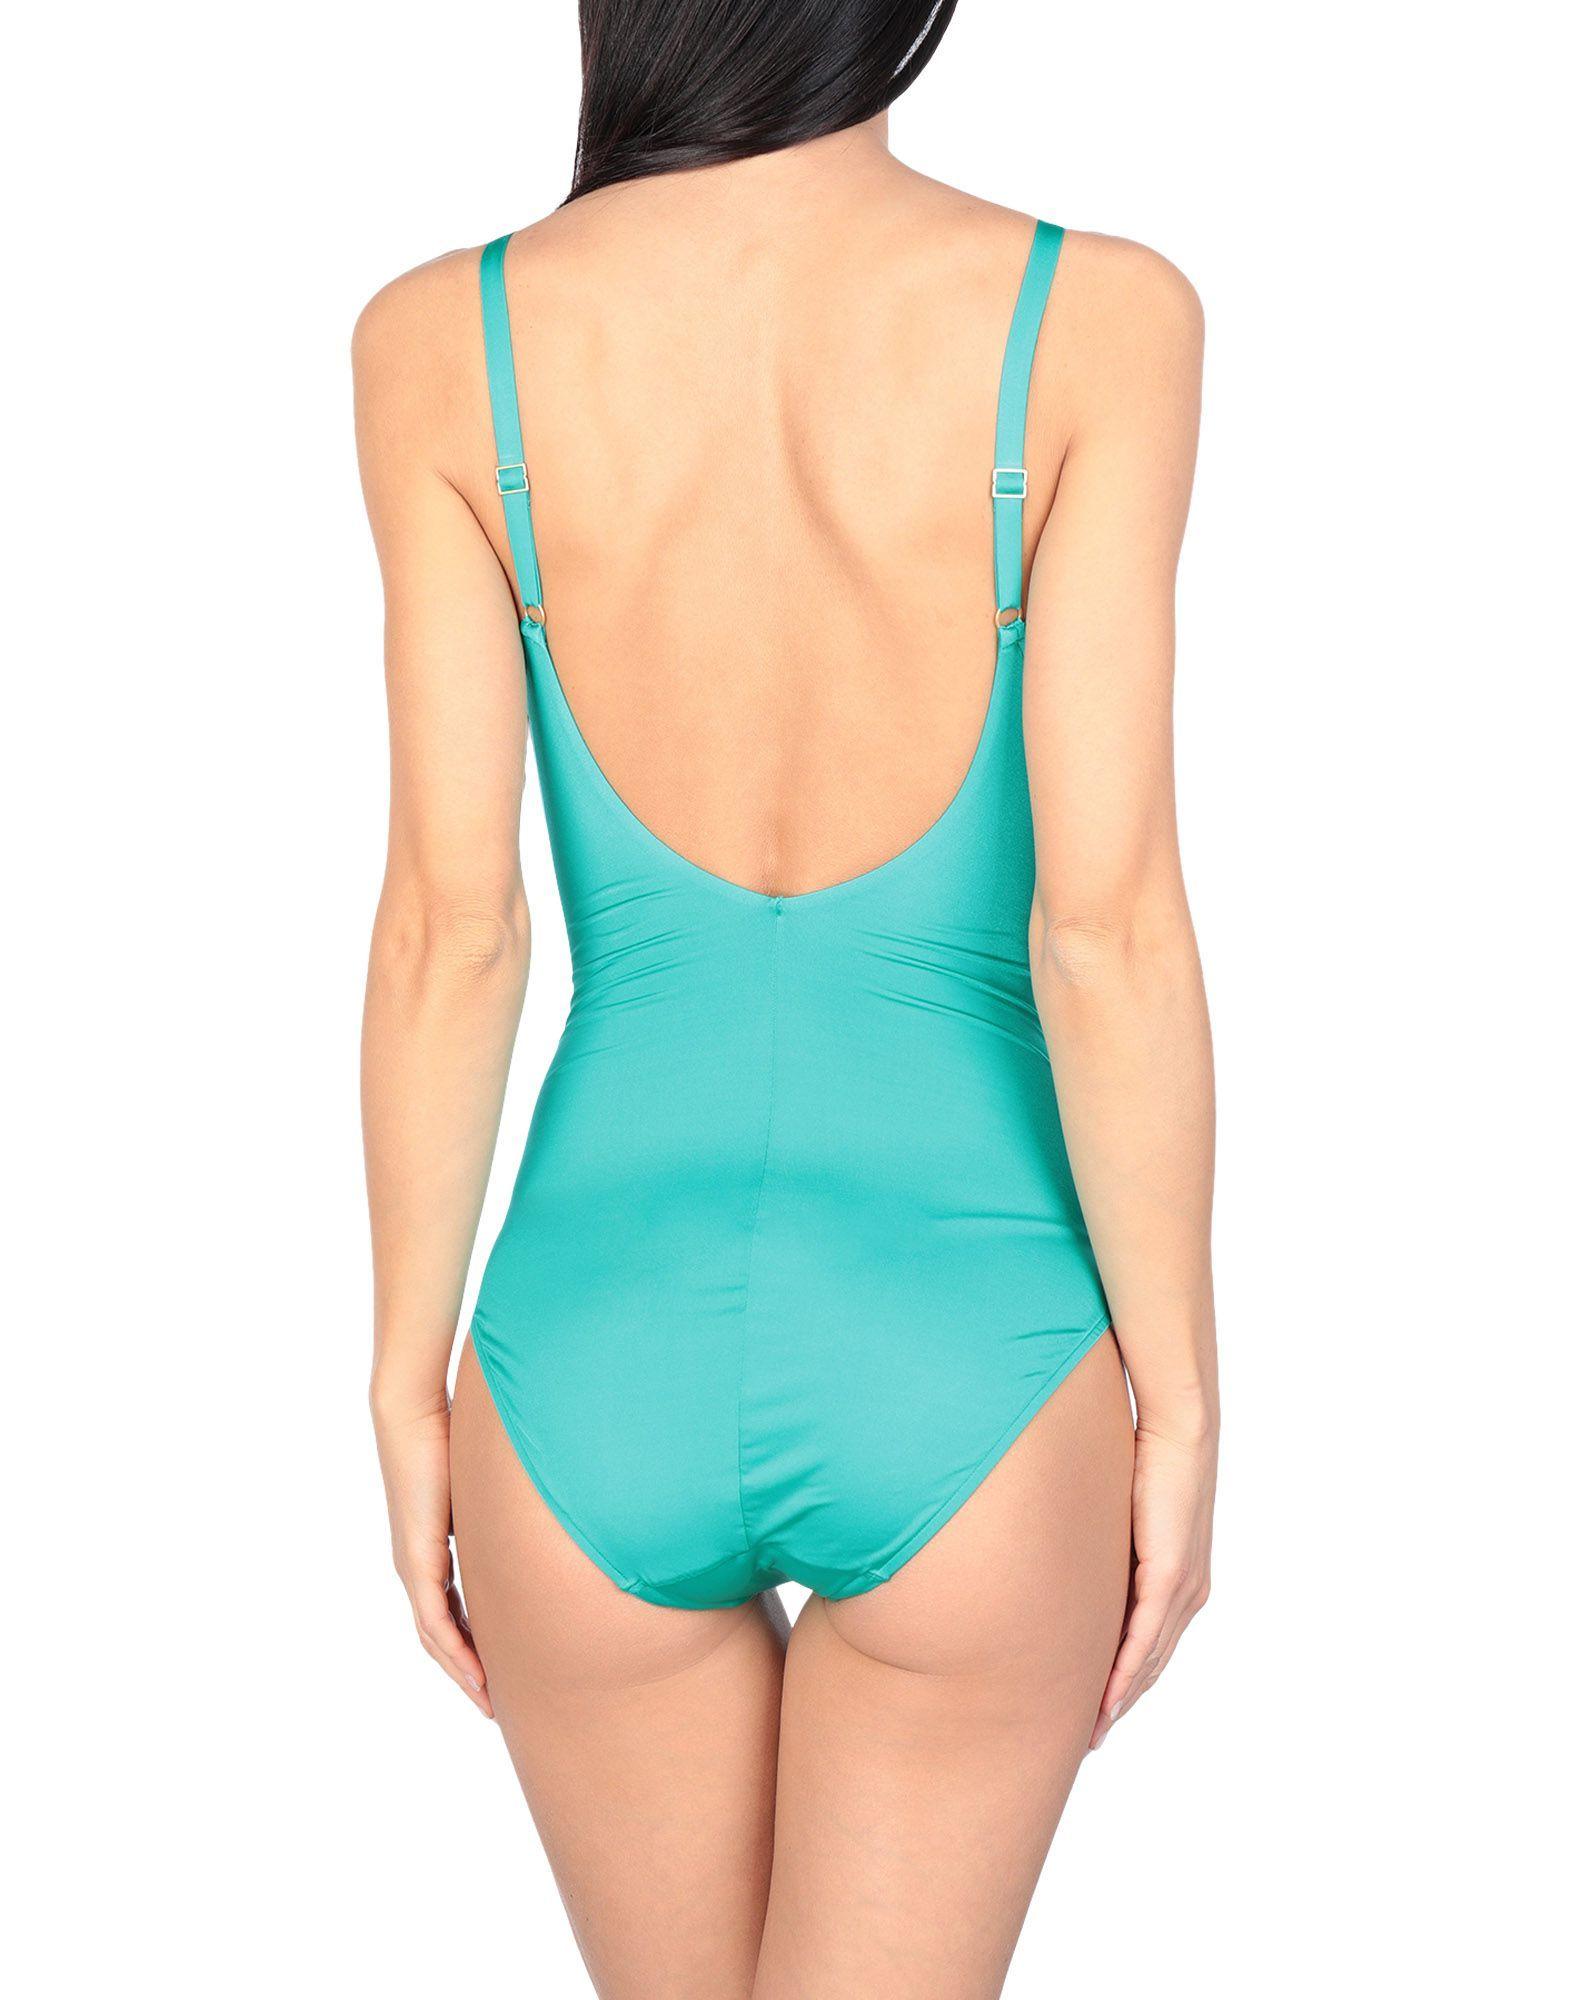 Chantelle Green Swimsuit